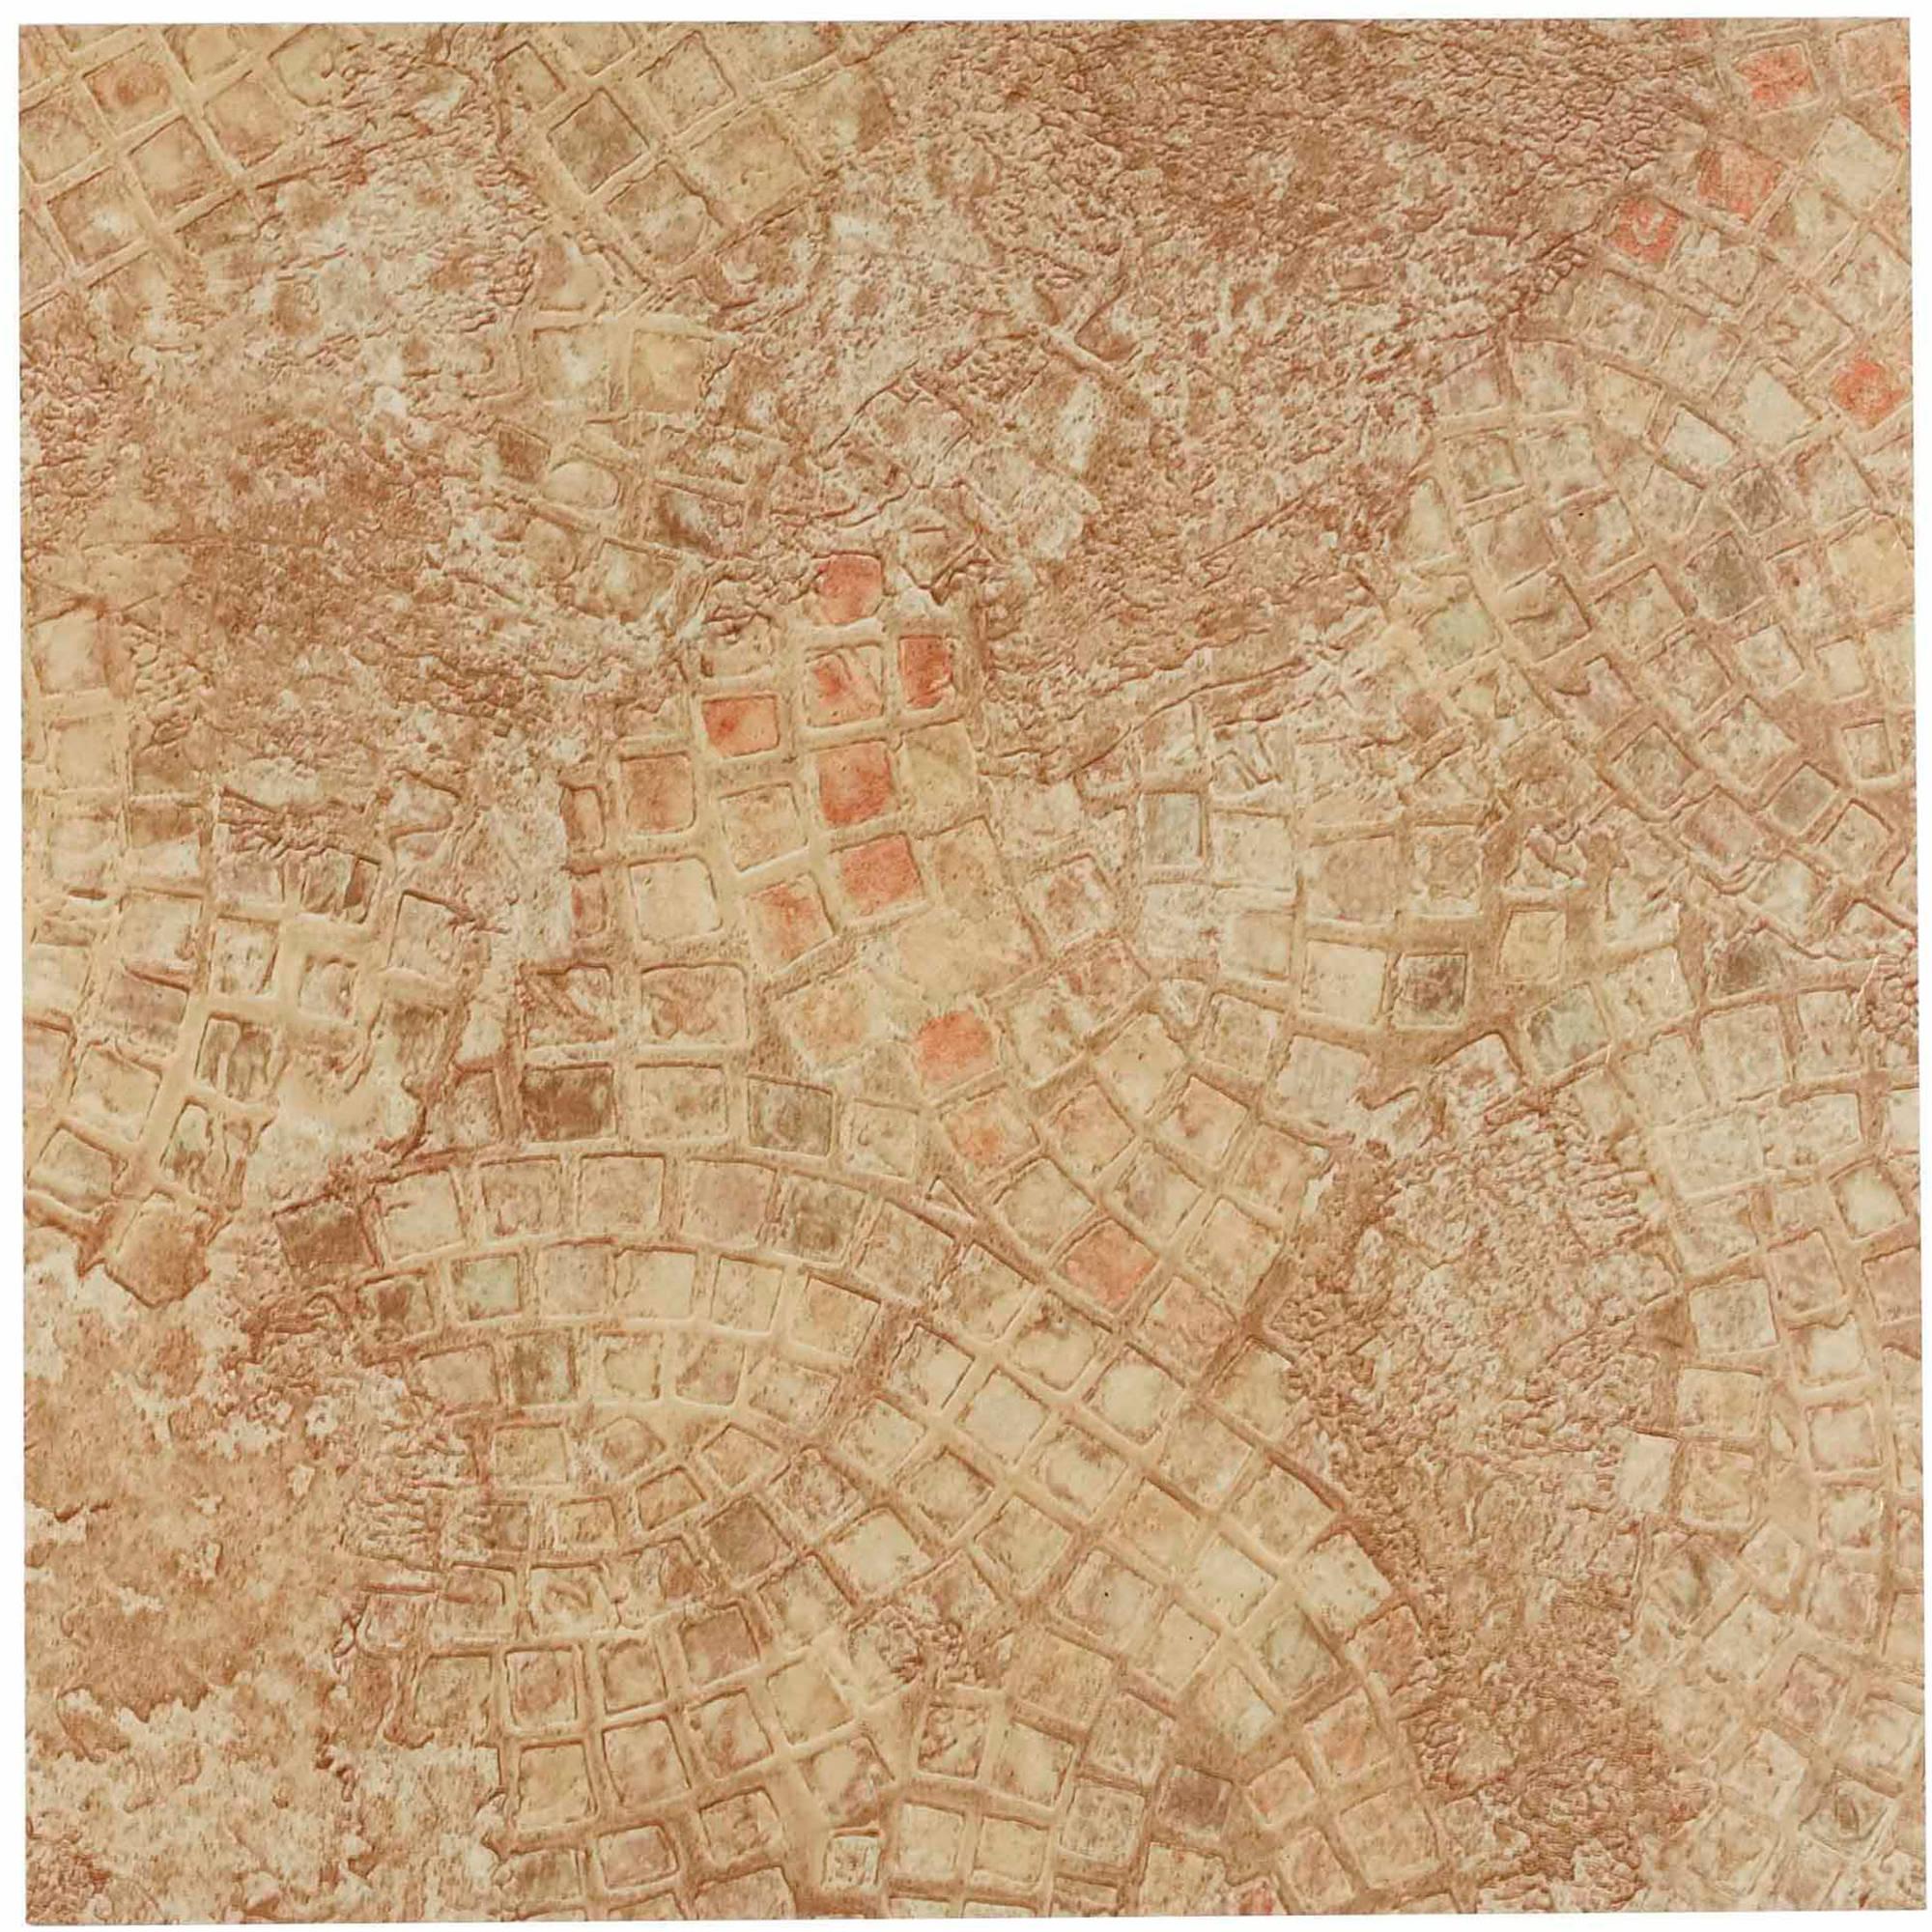 NEXUS Ancient Beige Mosaic 12x12 Self Adhesive Vinyl Floor Tile - 20 Tiles/20 Sq.Ft.